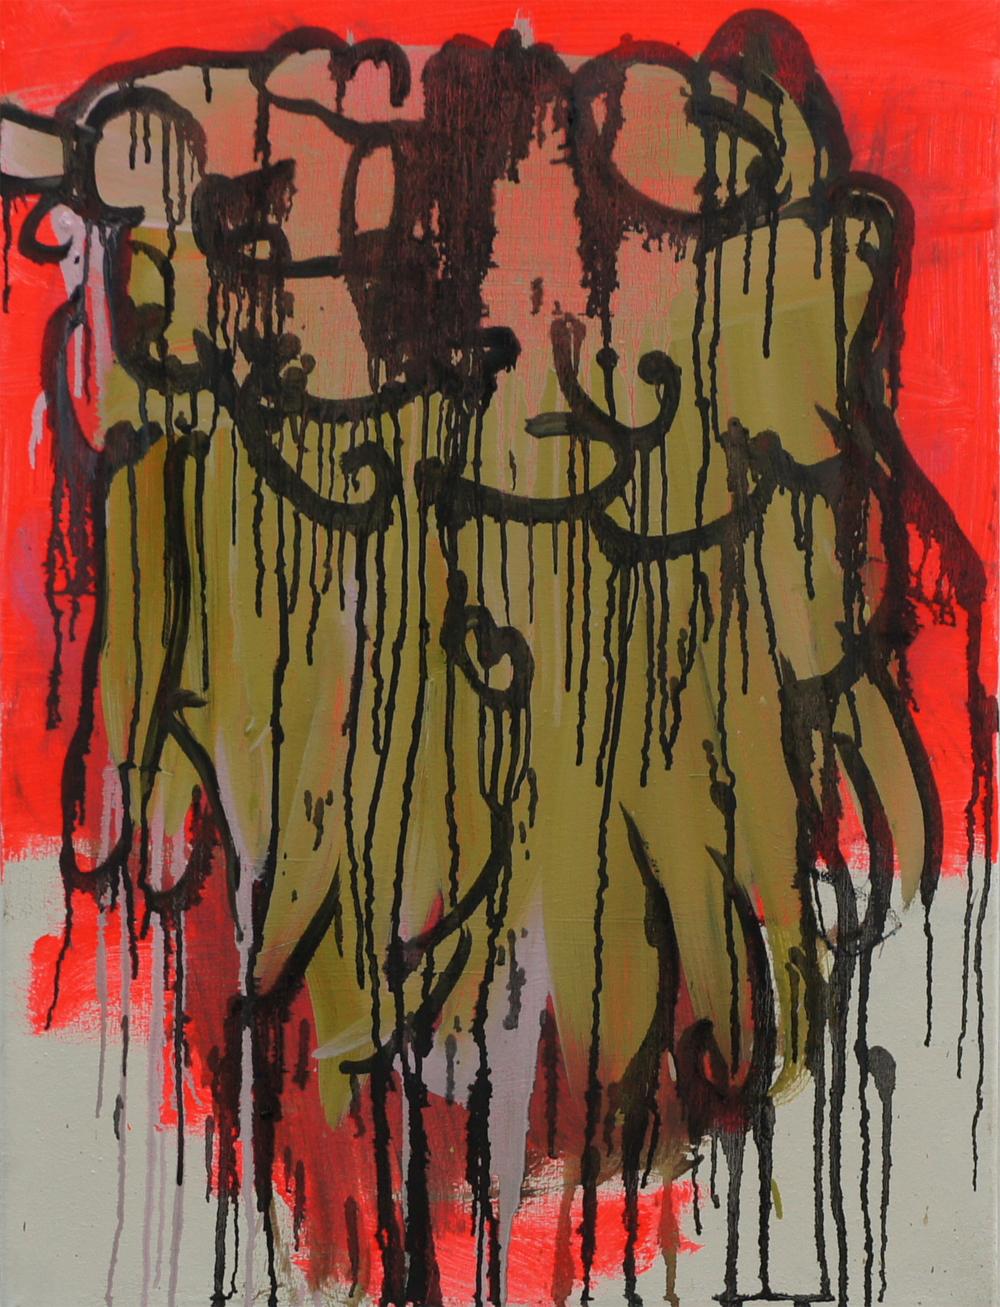 Sabine Tress, Mischpoke, 2014, 70 x 40 cm, oil and acrylic on canvas (courtesy o